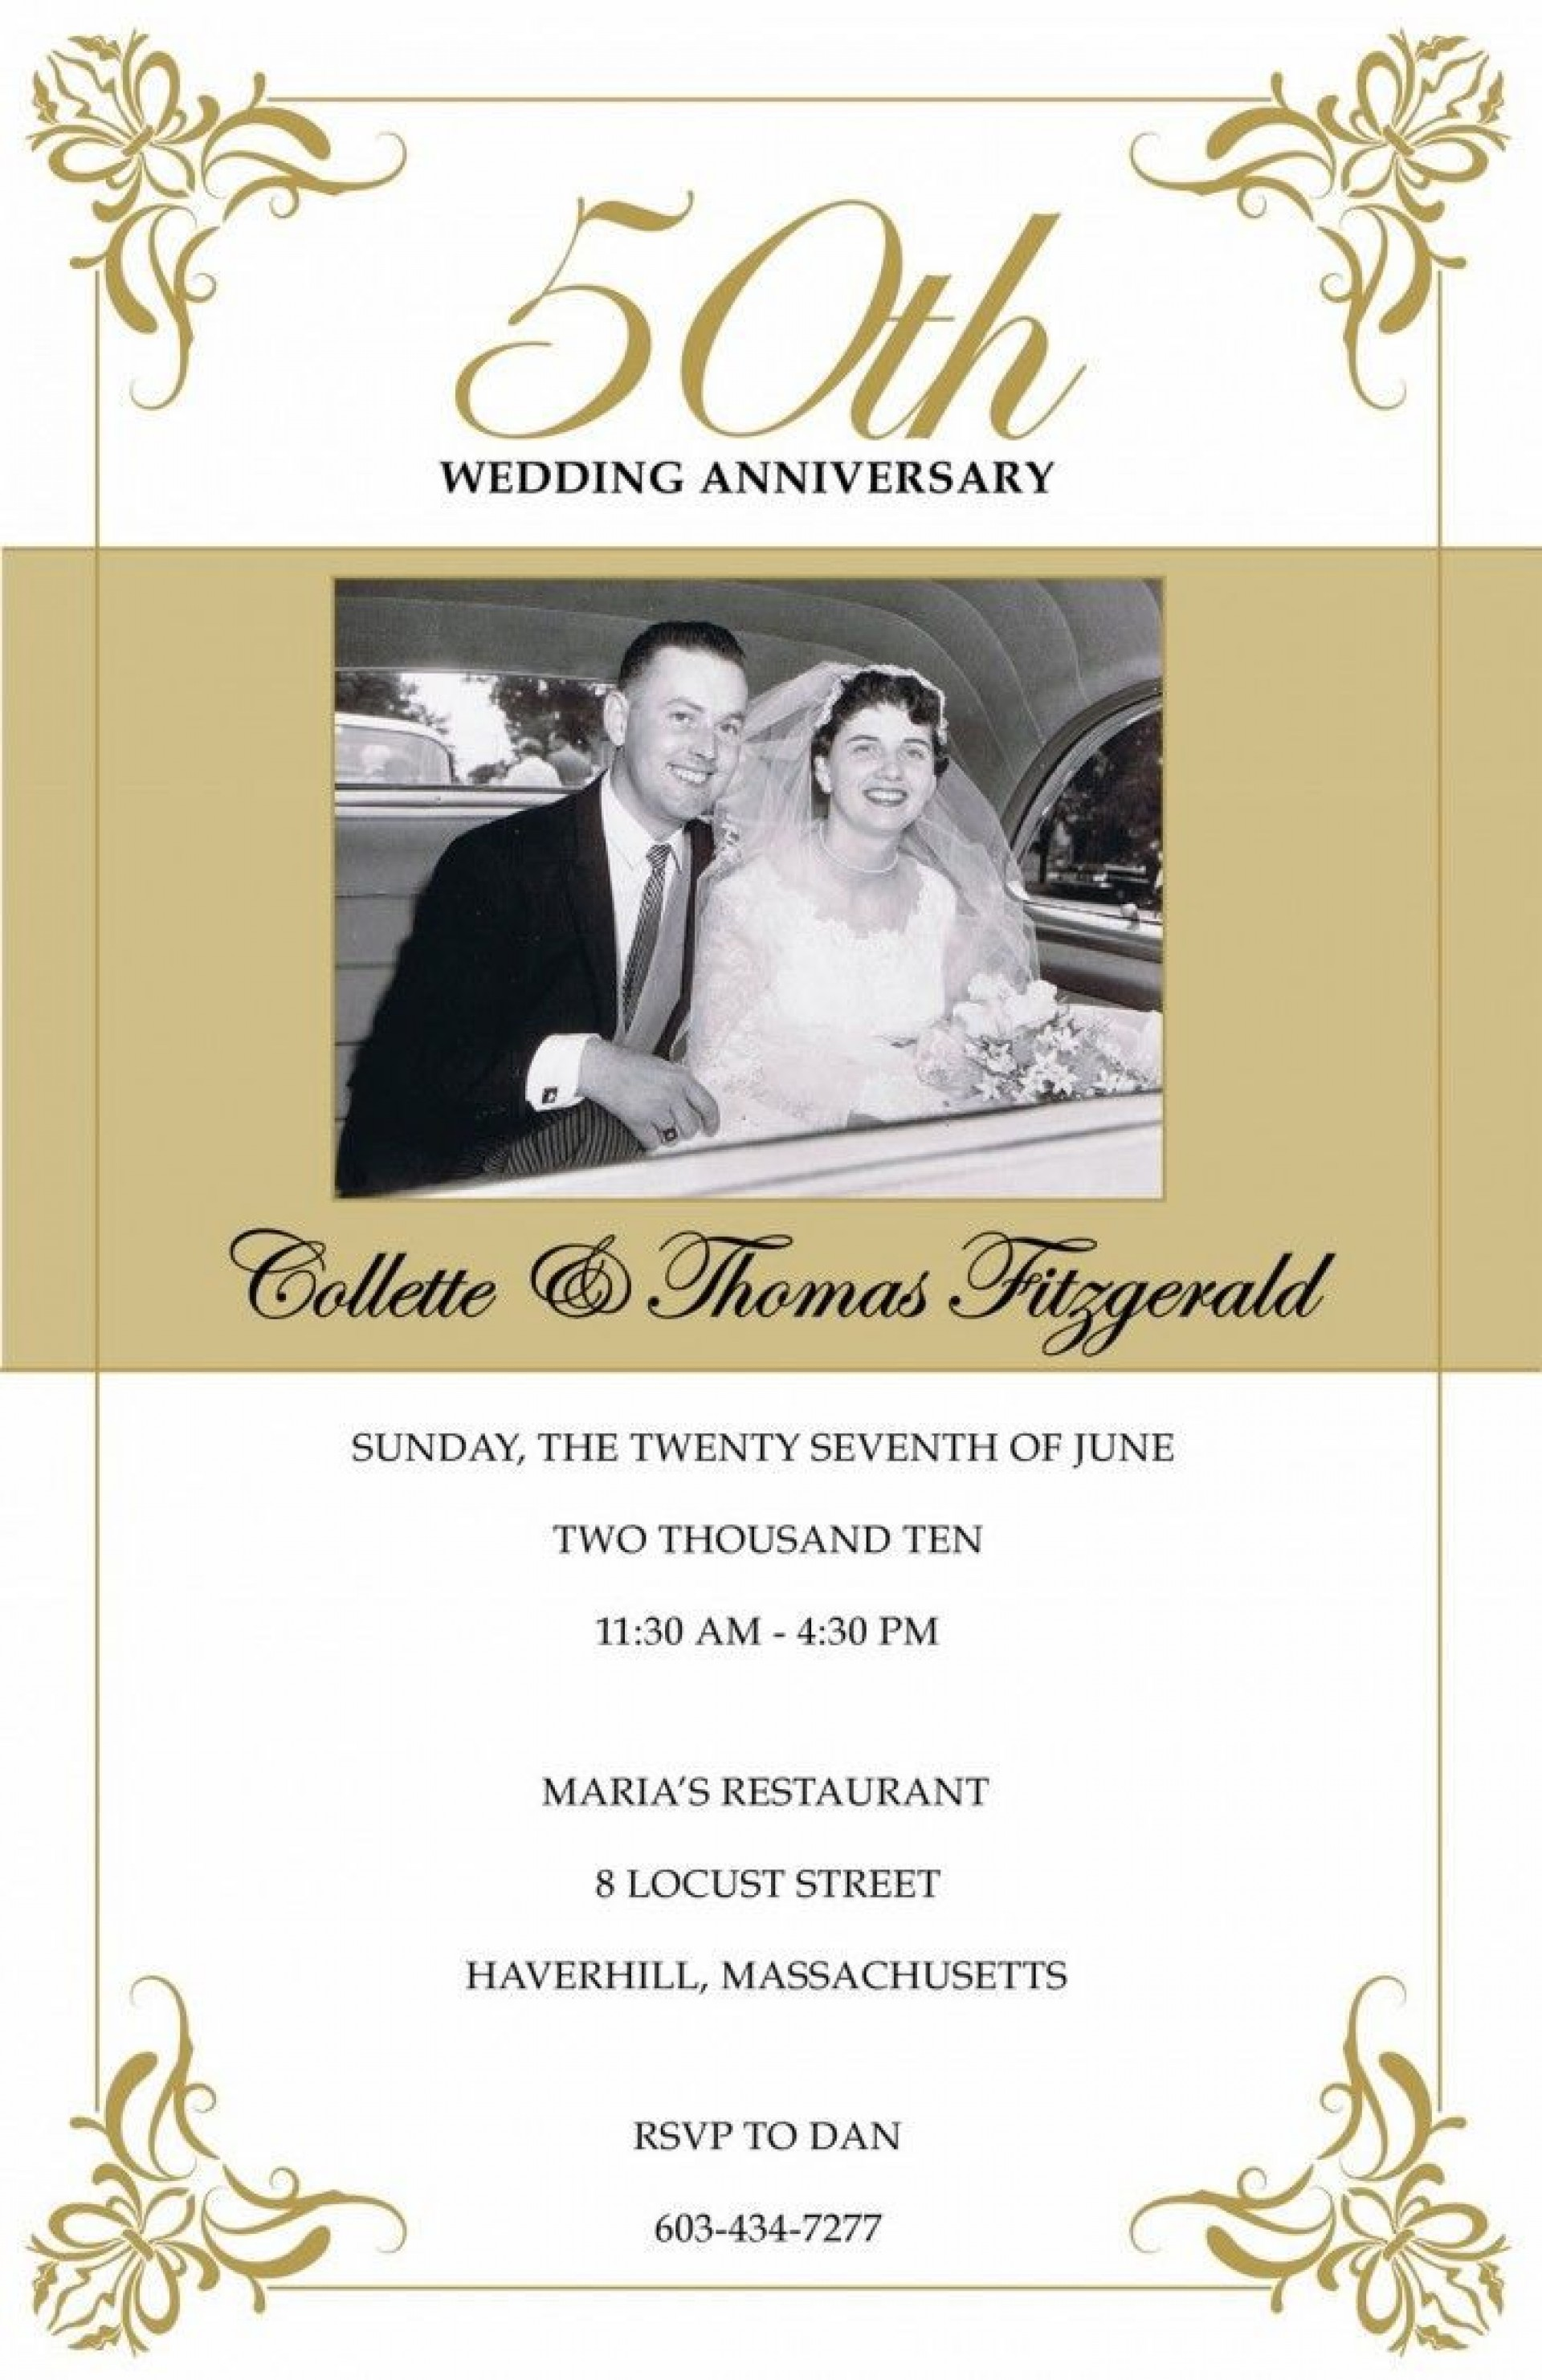 008 Wonderful Golden Wedding Anniversary Invitation Template Free Example  50th Microsoft Word Download1920